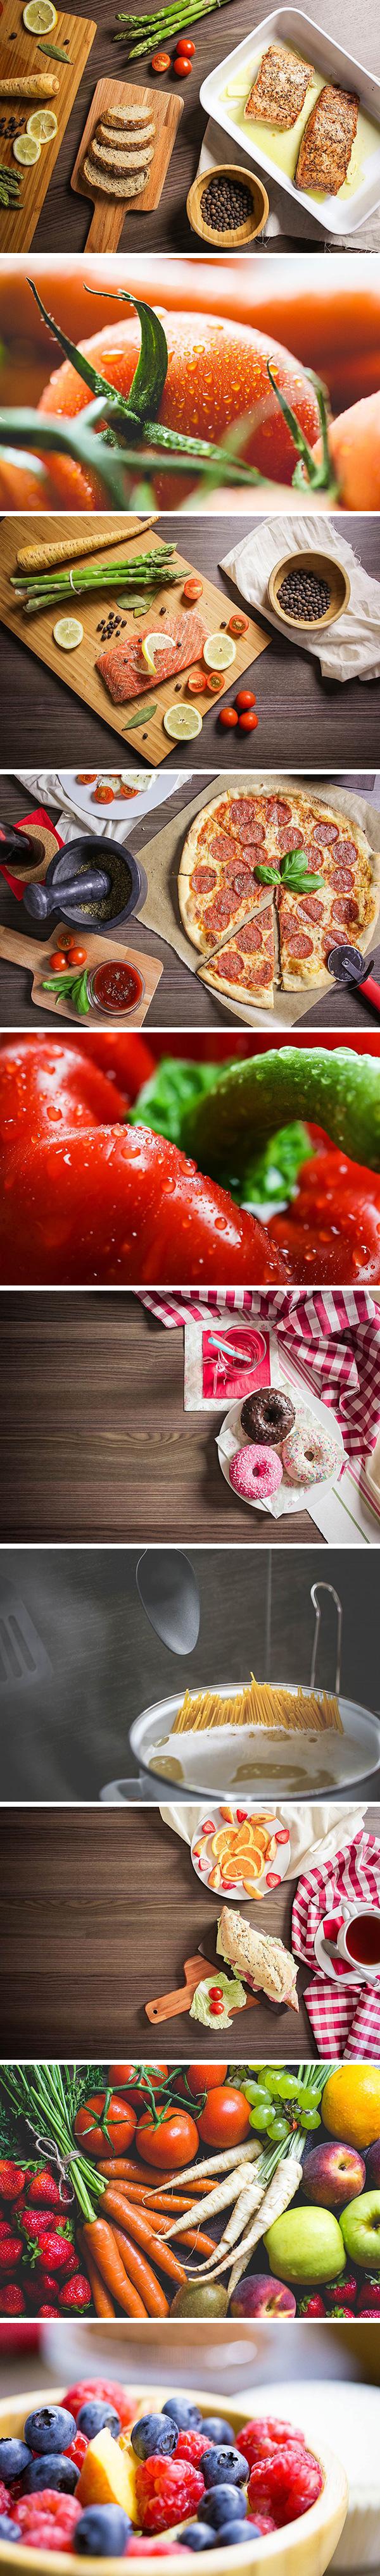 imagenes-de-comida-gratis